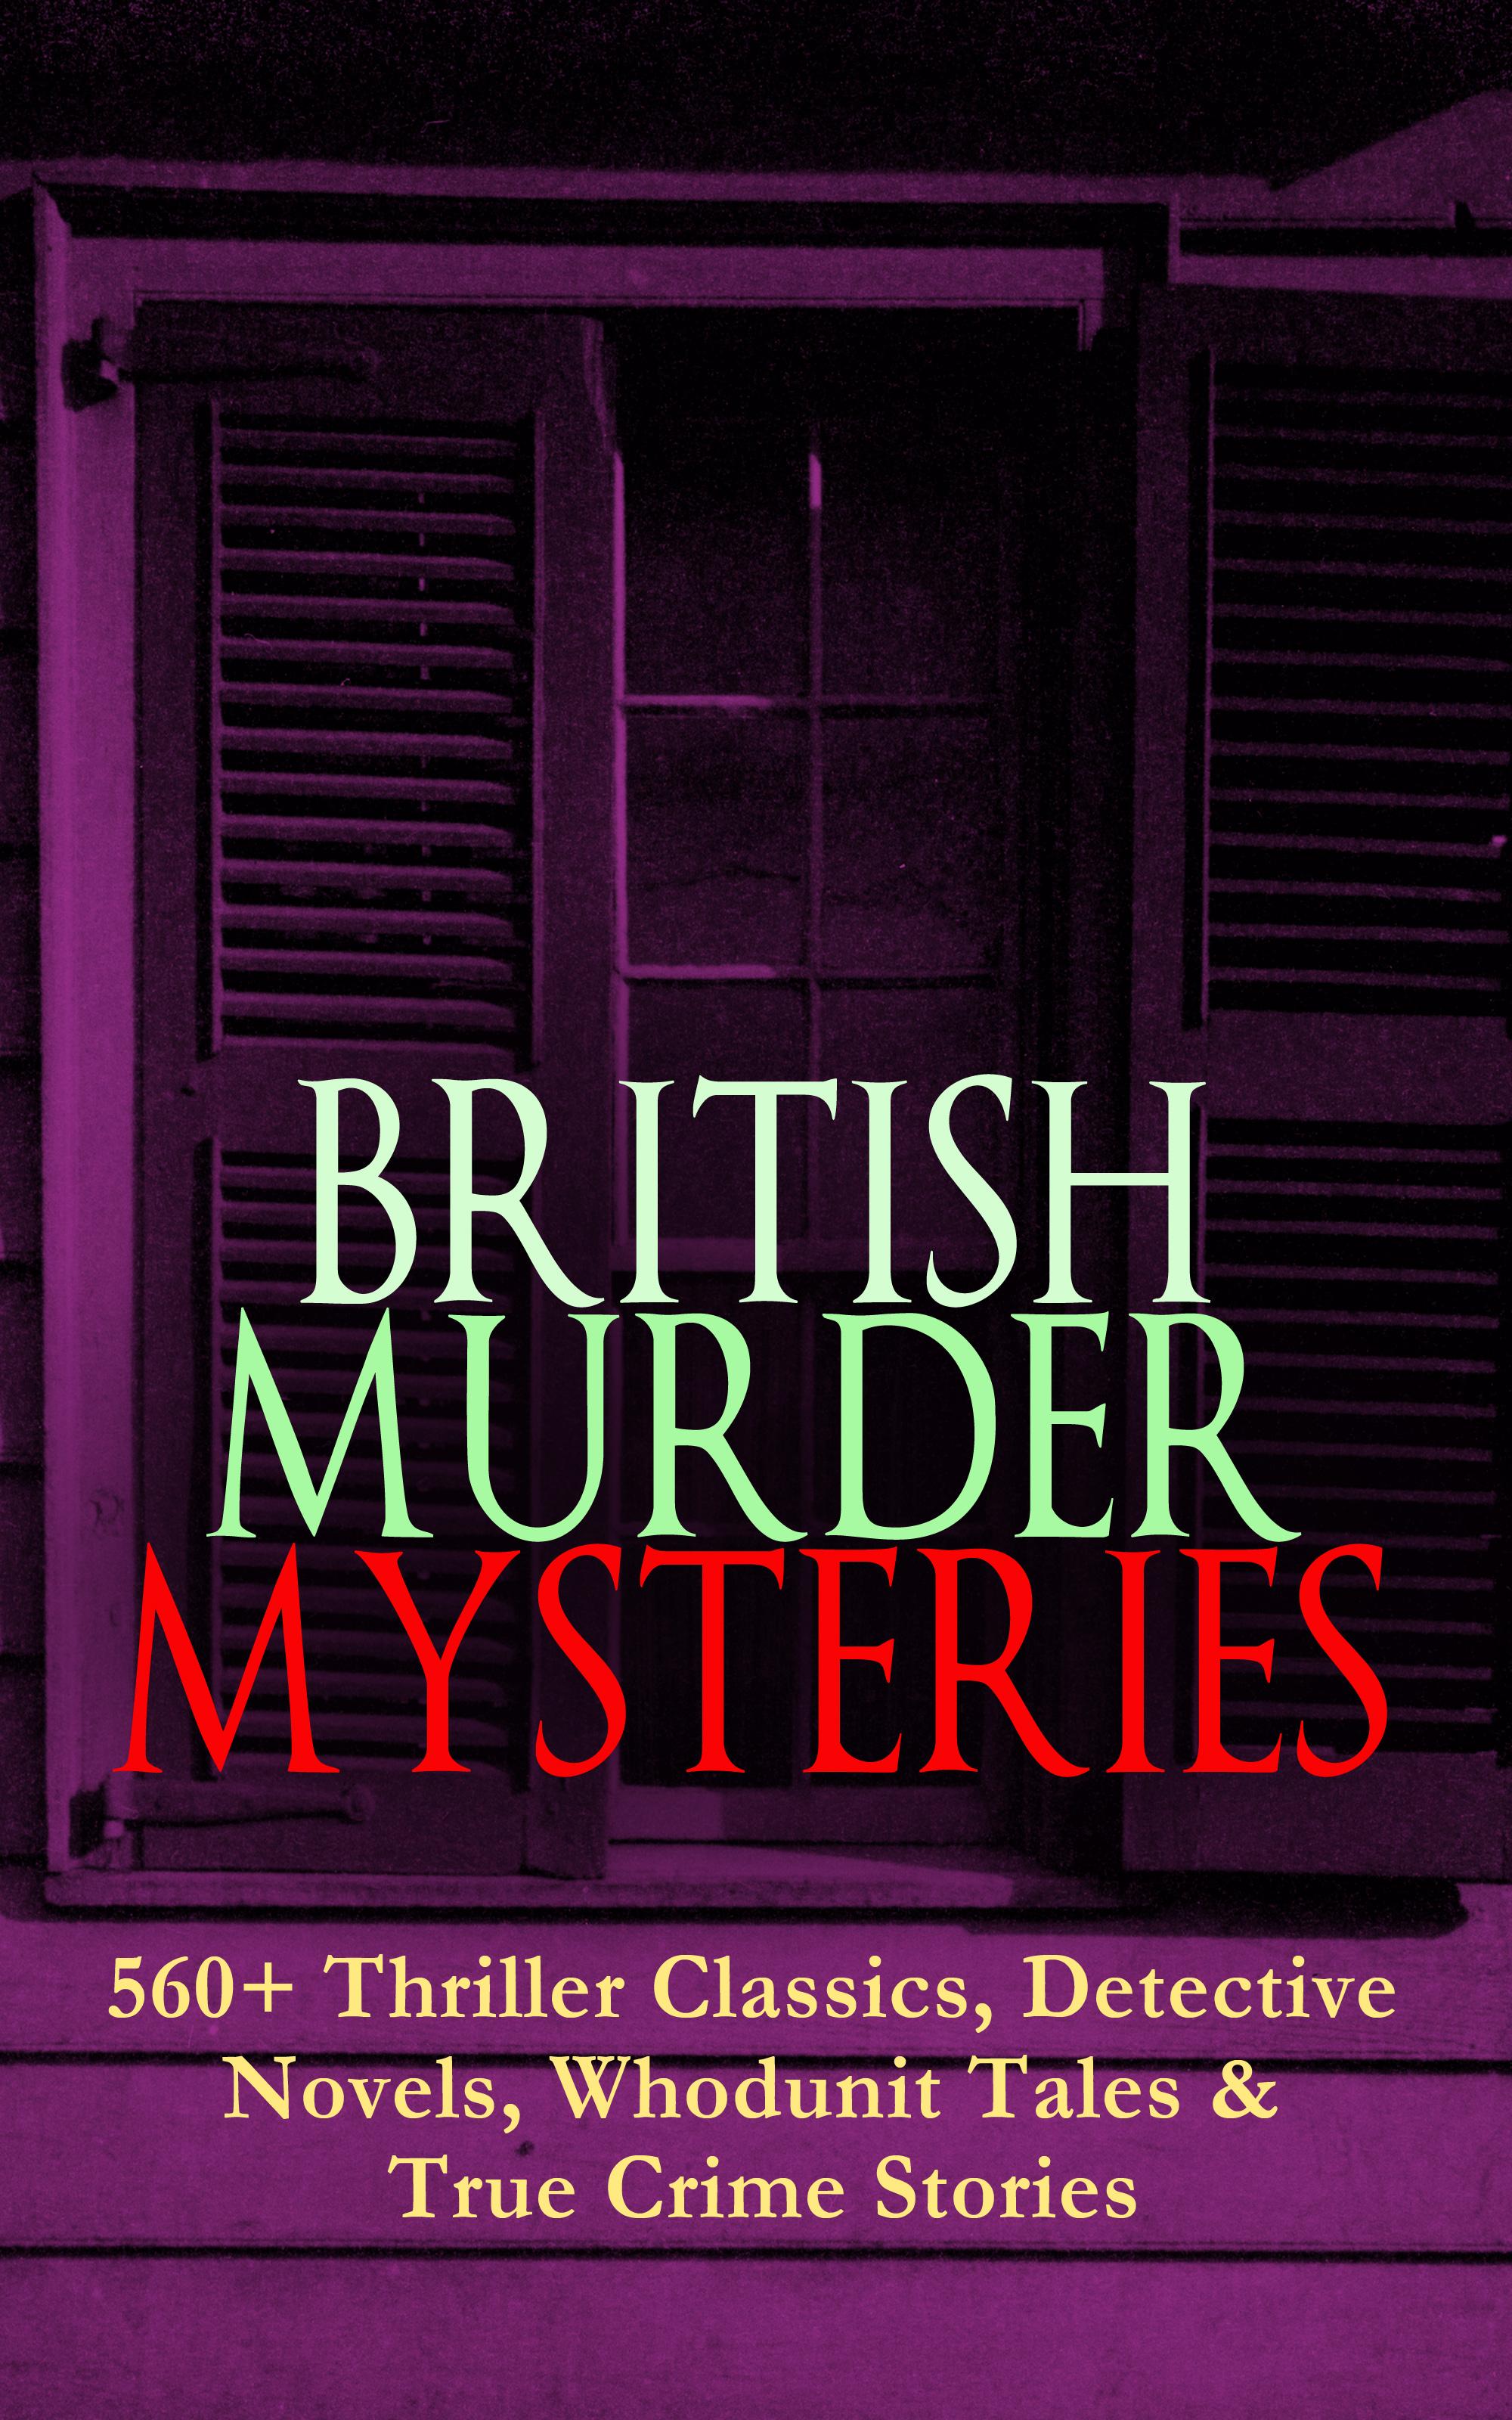 Гилберт Кит Честертон BRITISH MURDER MYSTERIES: 560+ Thriller Classics, Detective Novels, Whodunit Tales & True Crime Stories the advent killer crime thriller